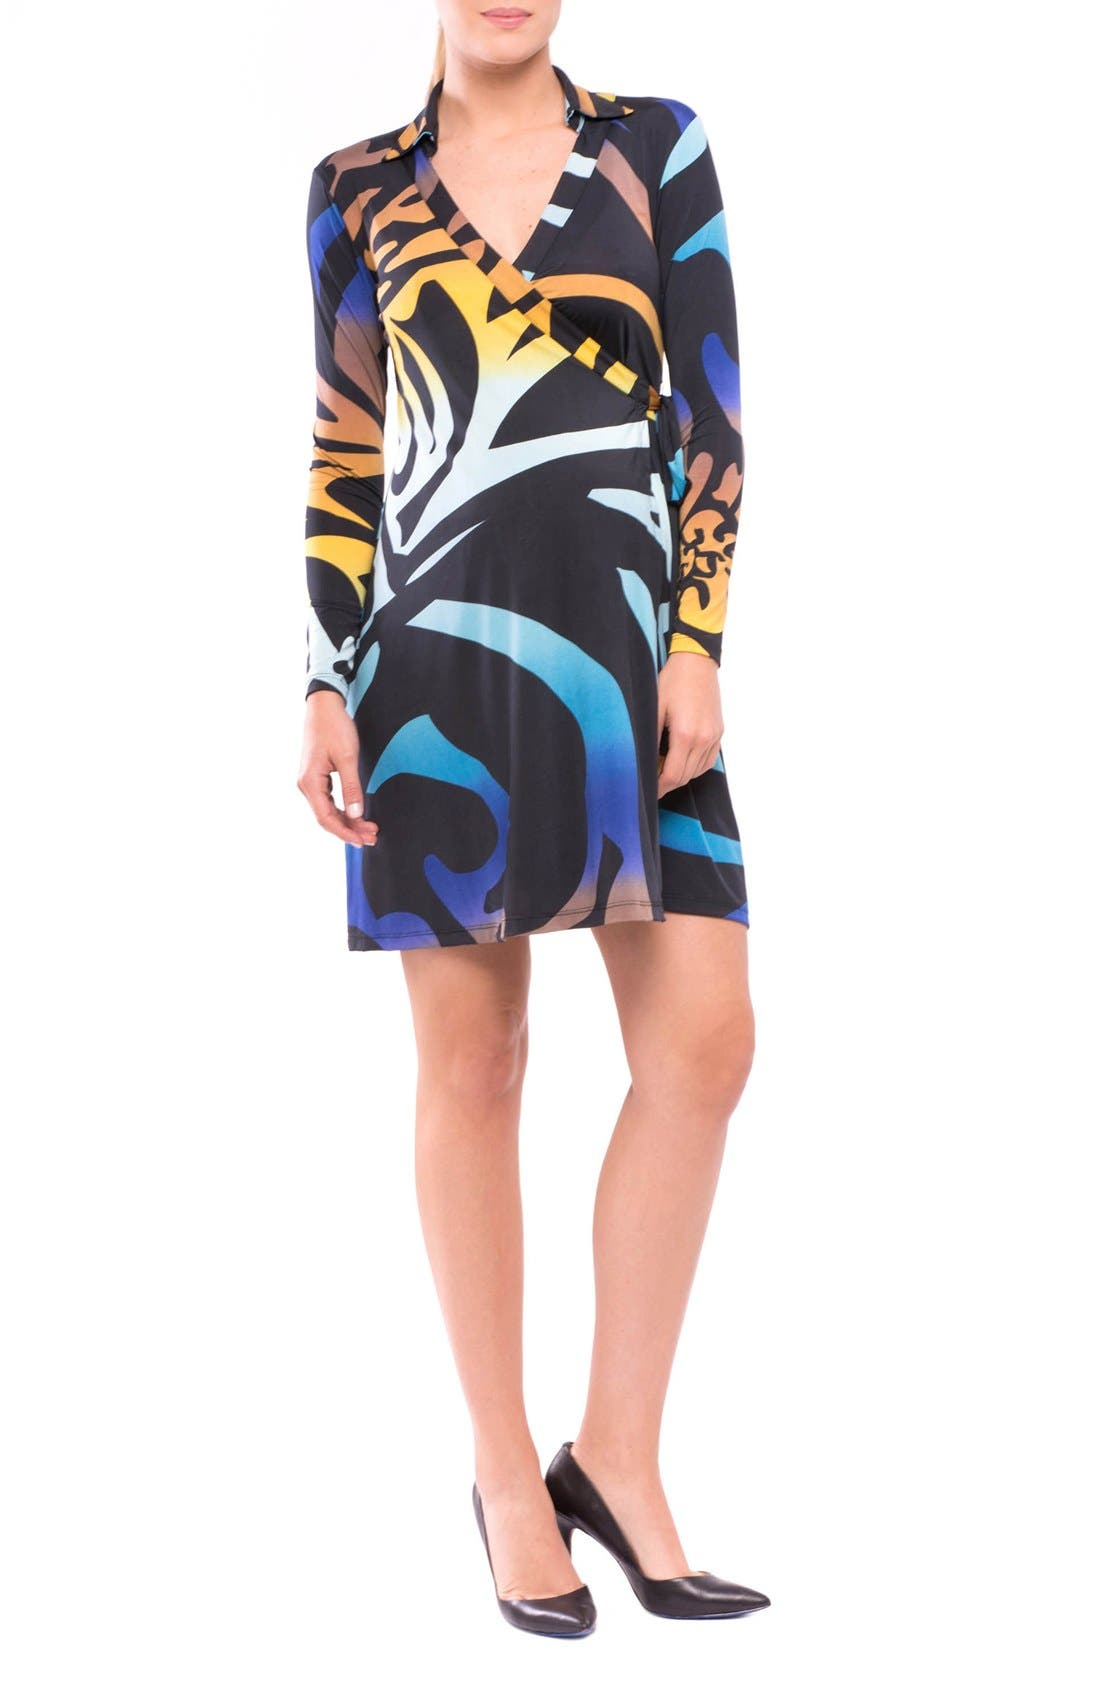 Lorraine Wrap Maternity Dress,                             Main thumbnail 1, color,                             BLUE/ YELLOW PRINT